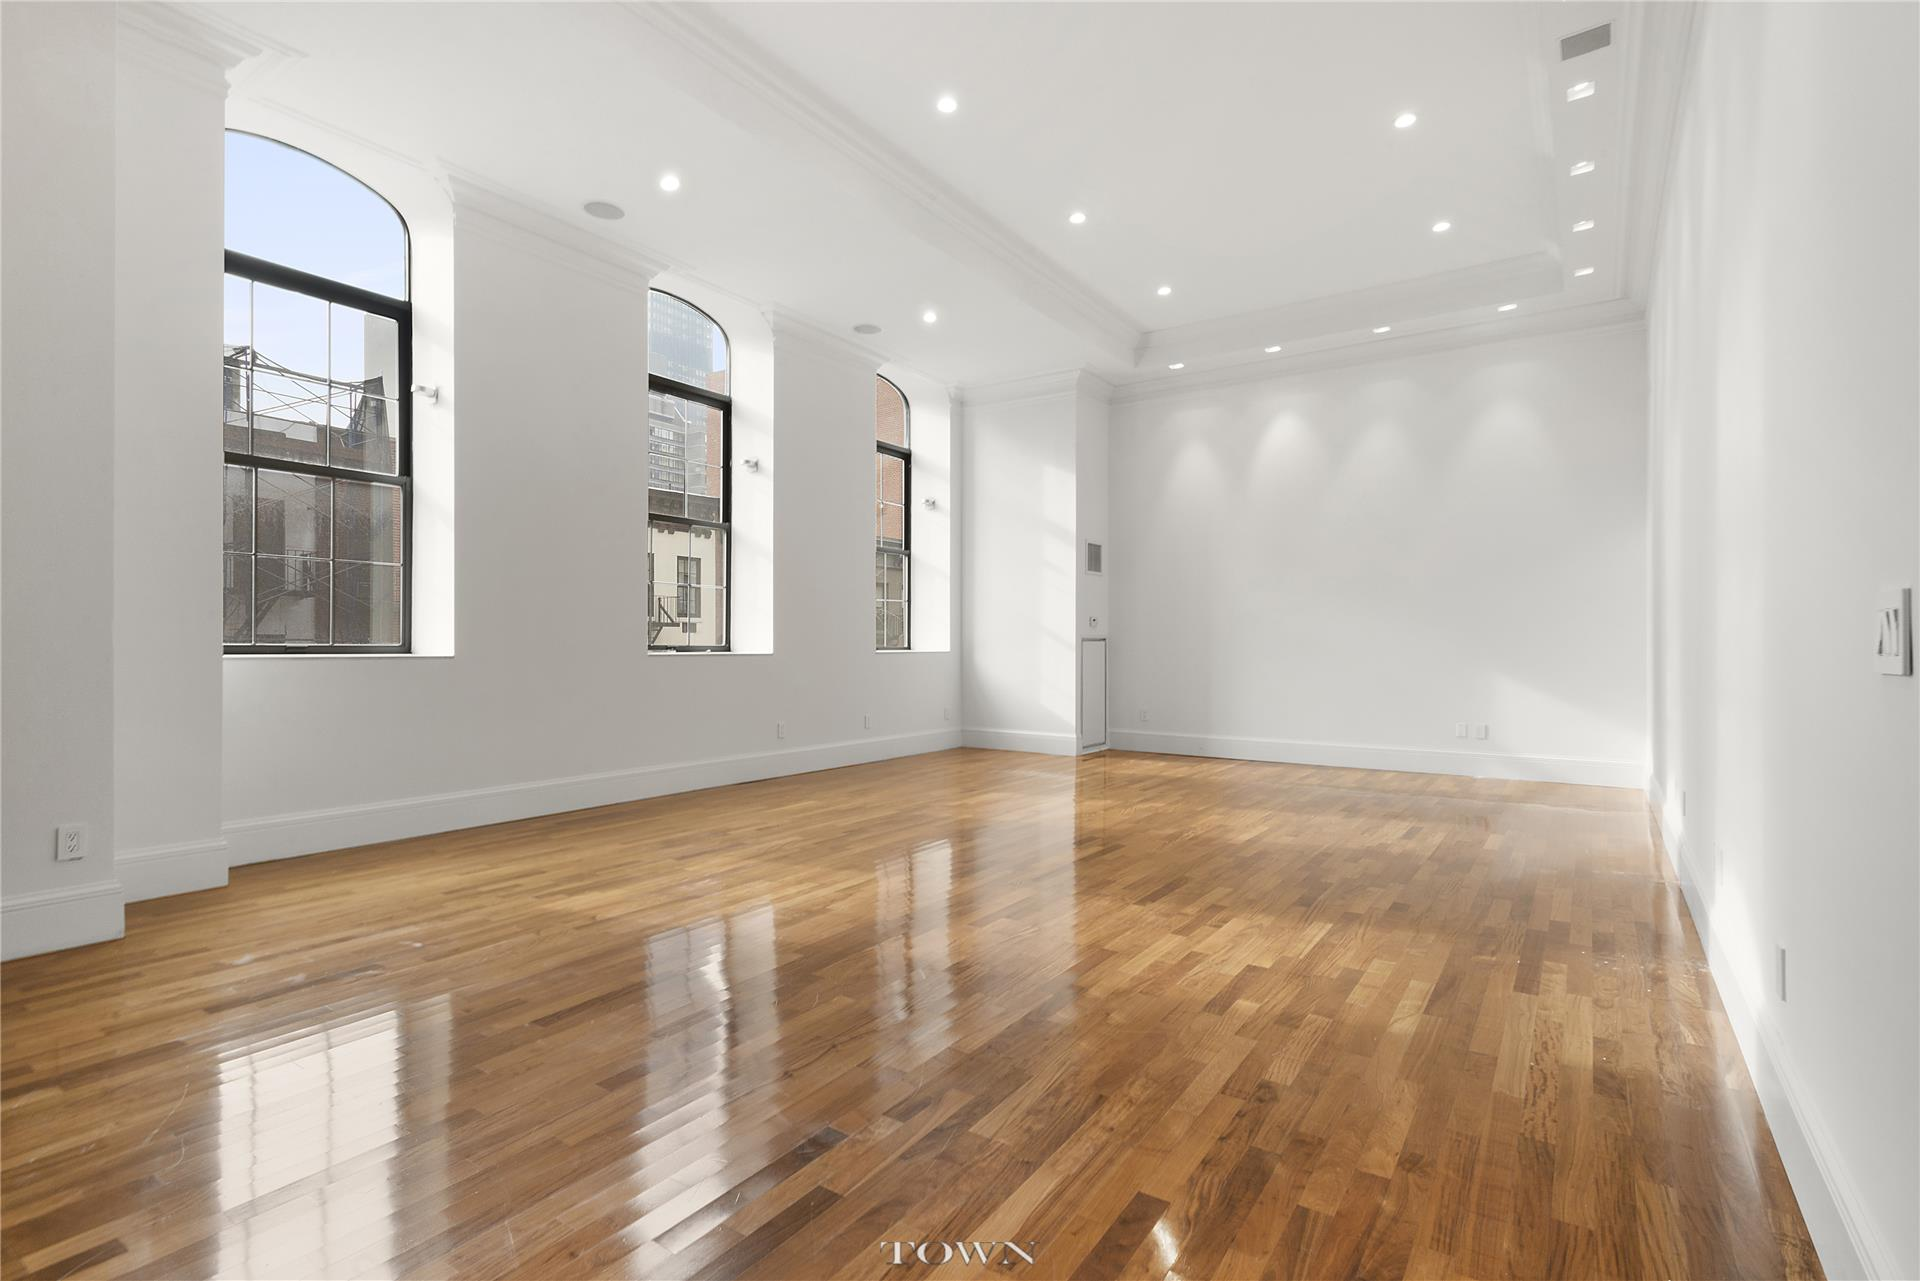 Condominium for Rent at The Beekman Regent, 351 East 51st Street, #loft-5e 351 East 51st Street New York, New York 10022 United States